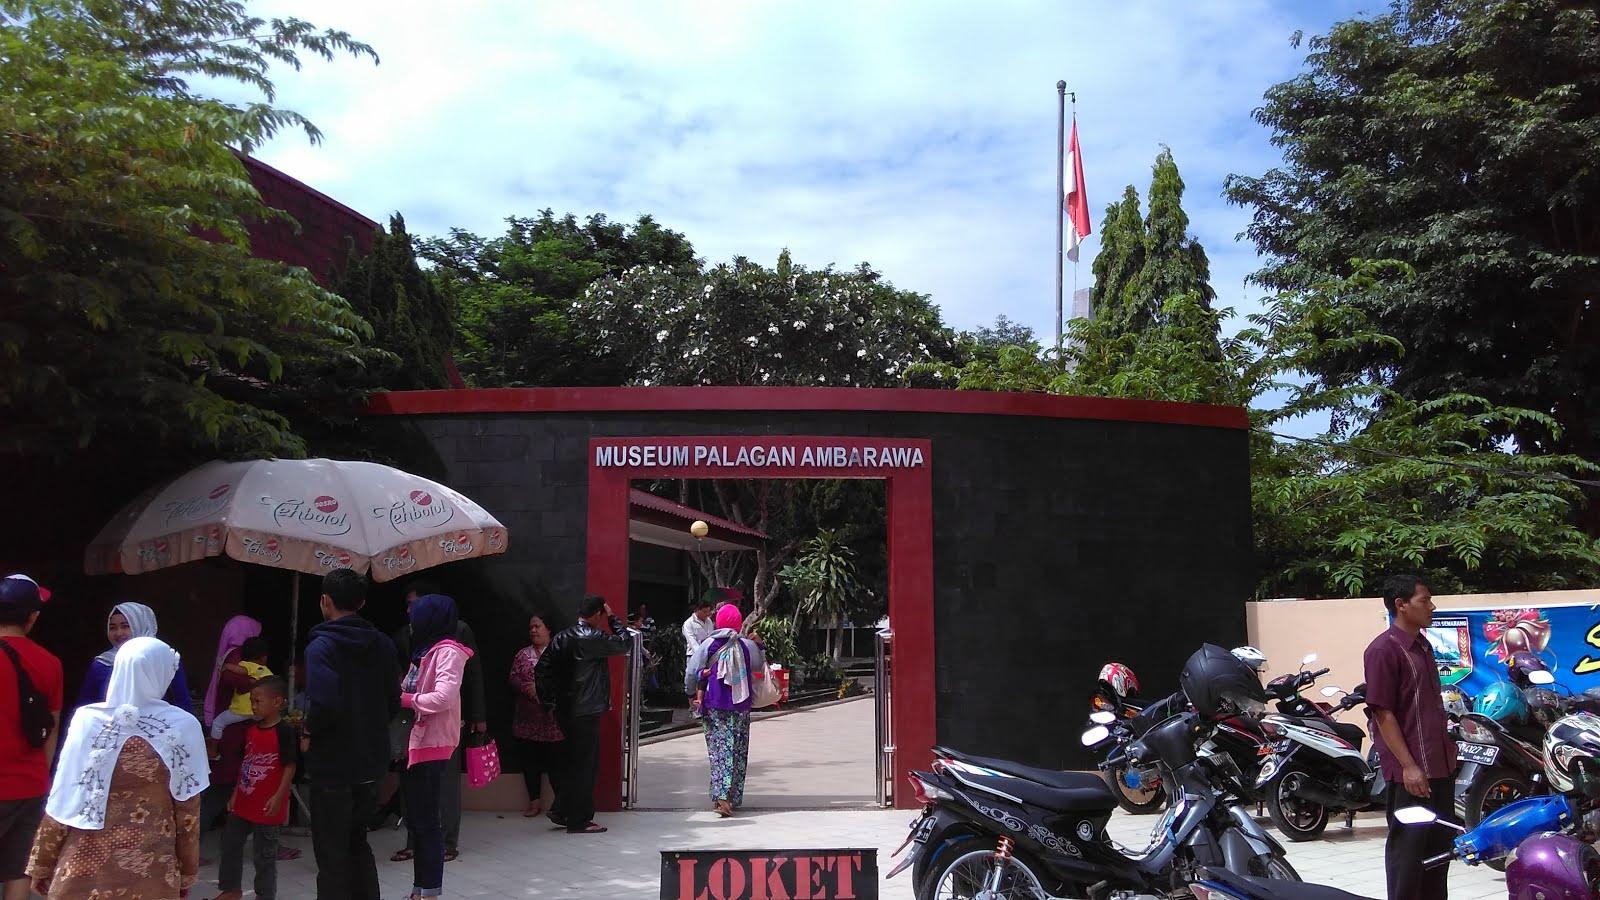 Asssyikknya Monumen Palagan Ambarawa Cakrawala International Tour Https Www Google